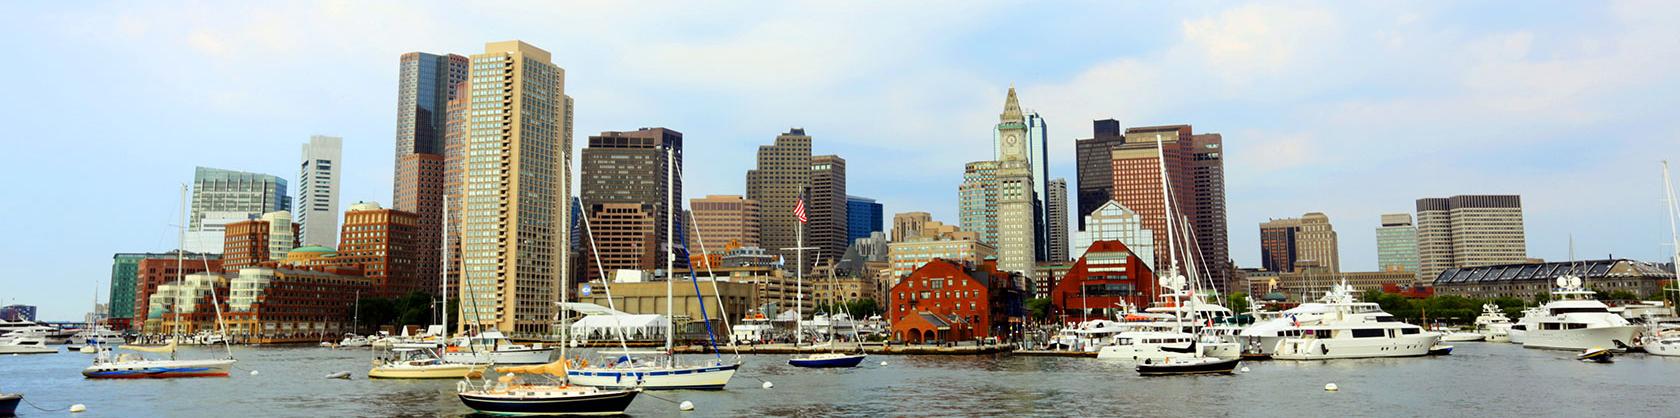 image of boston harbor